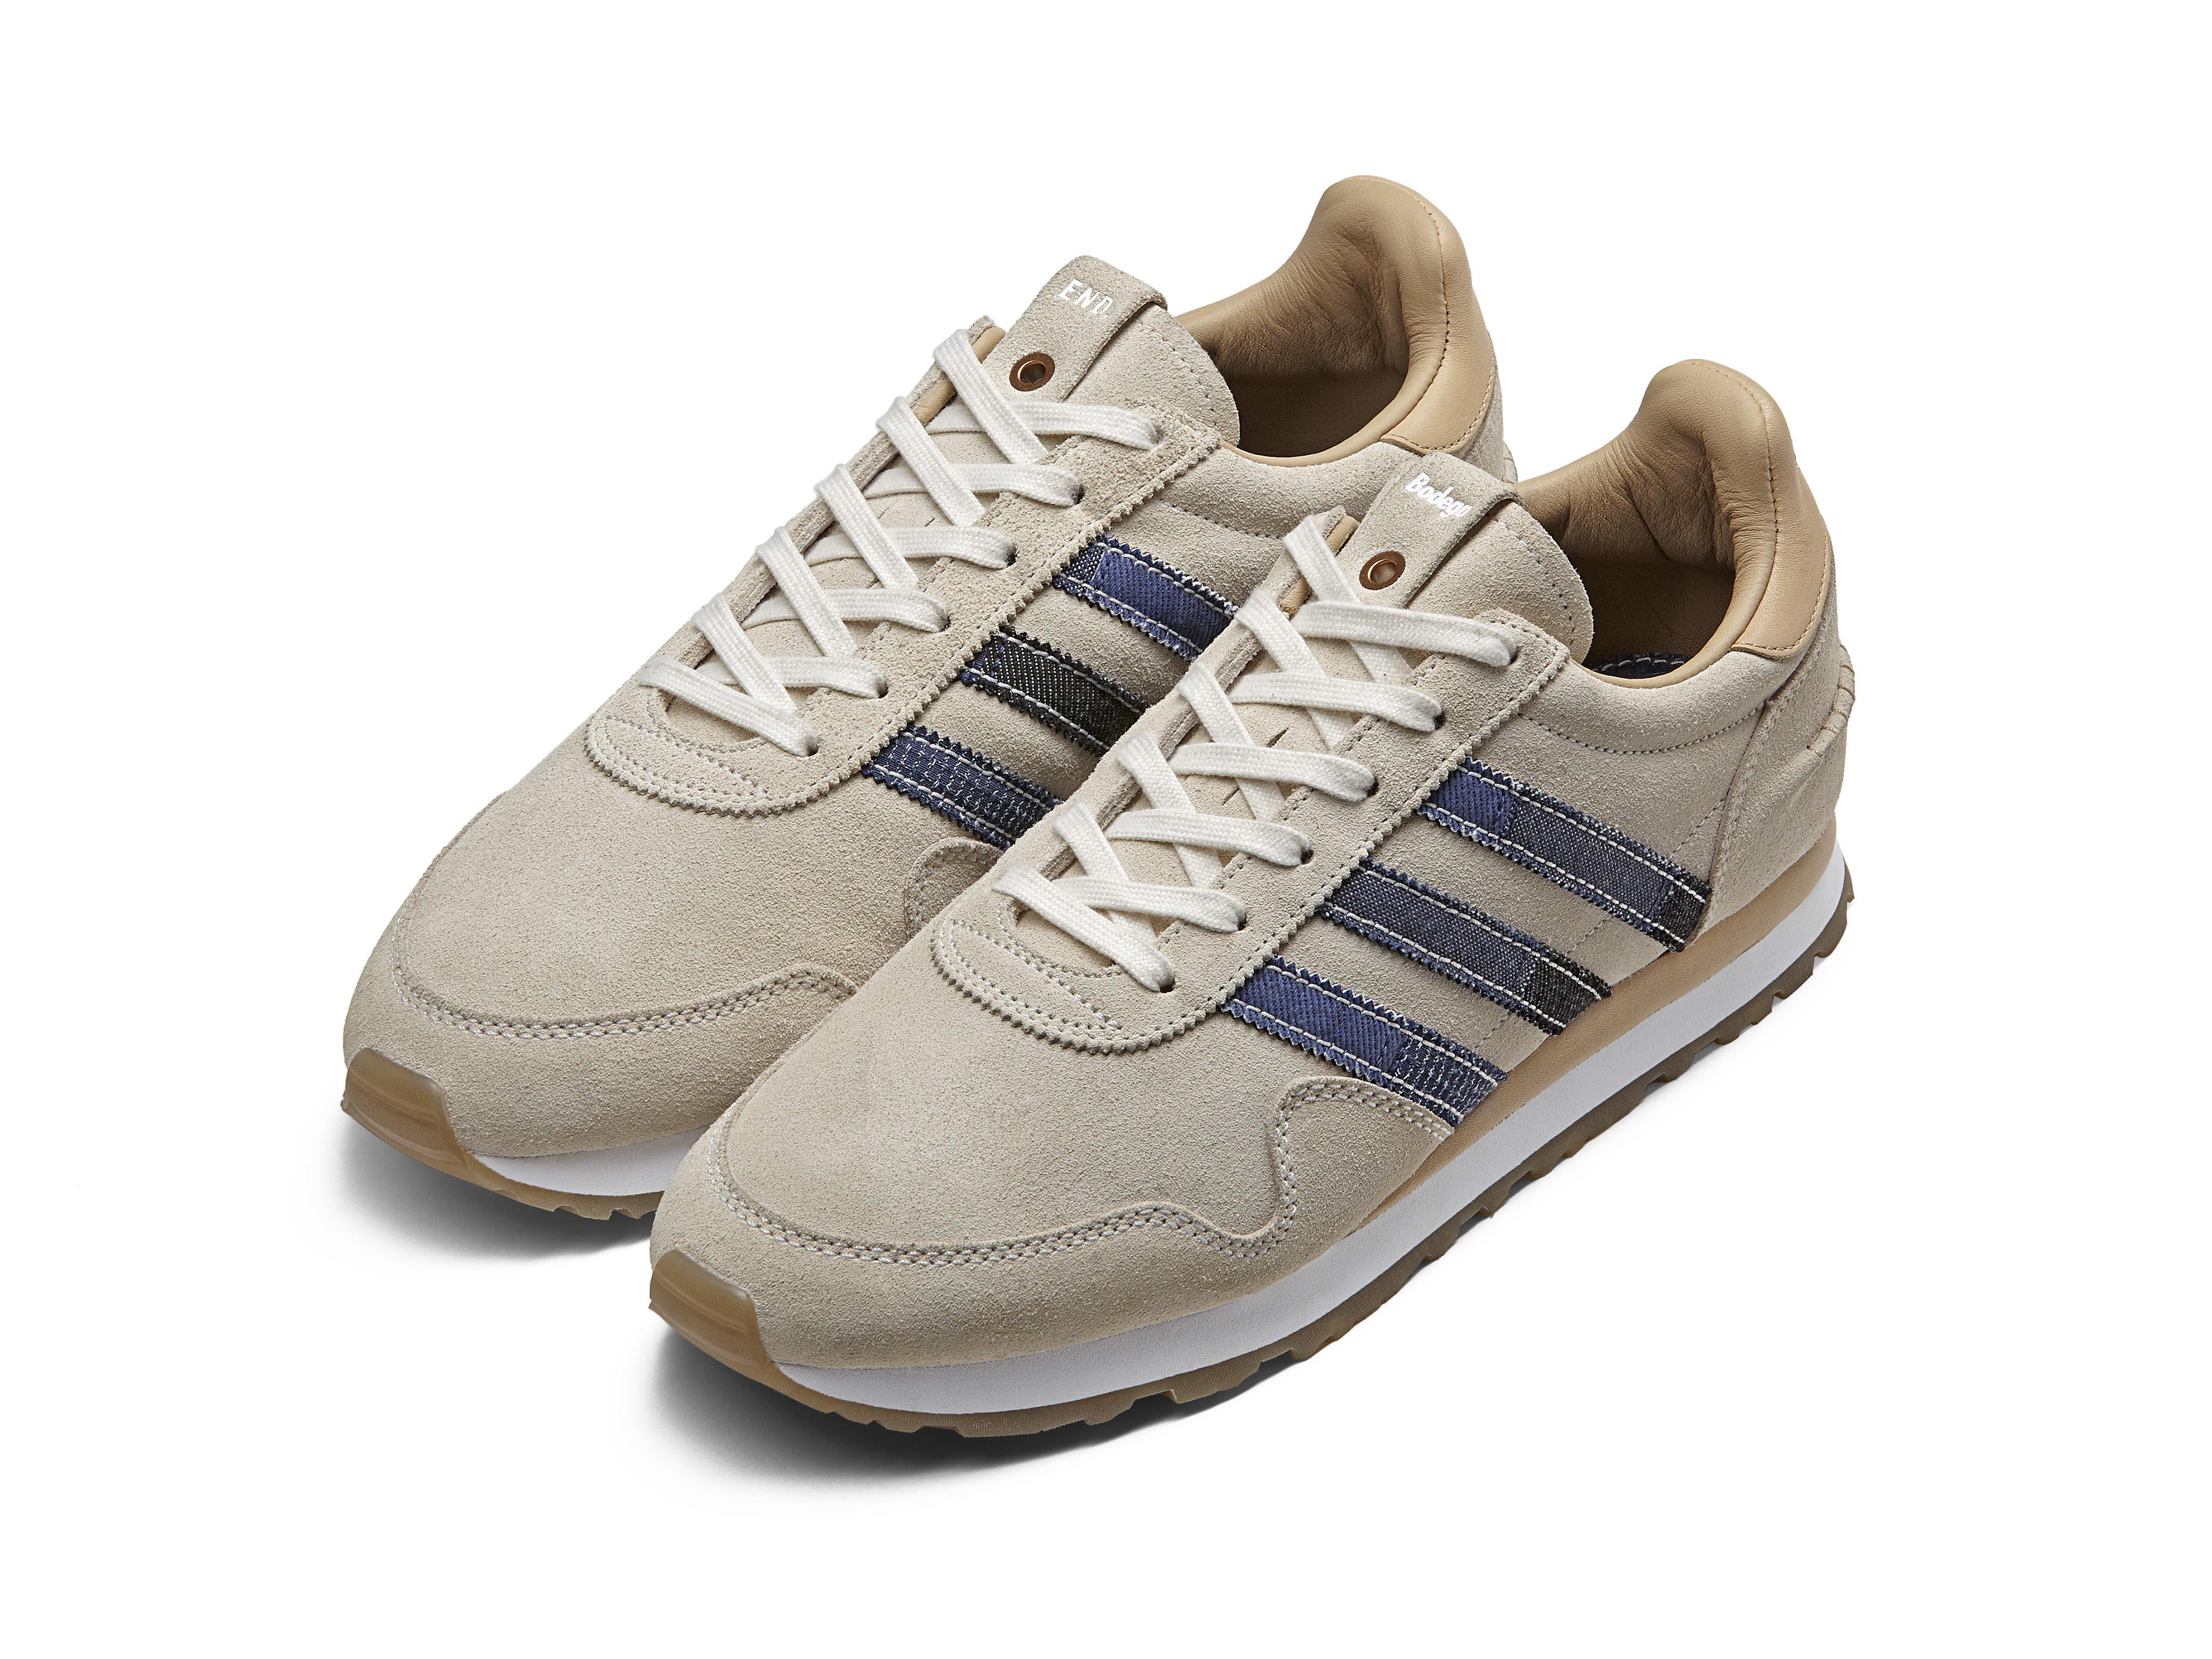 Adidas End Bodega